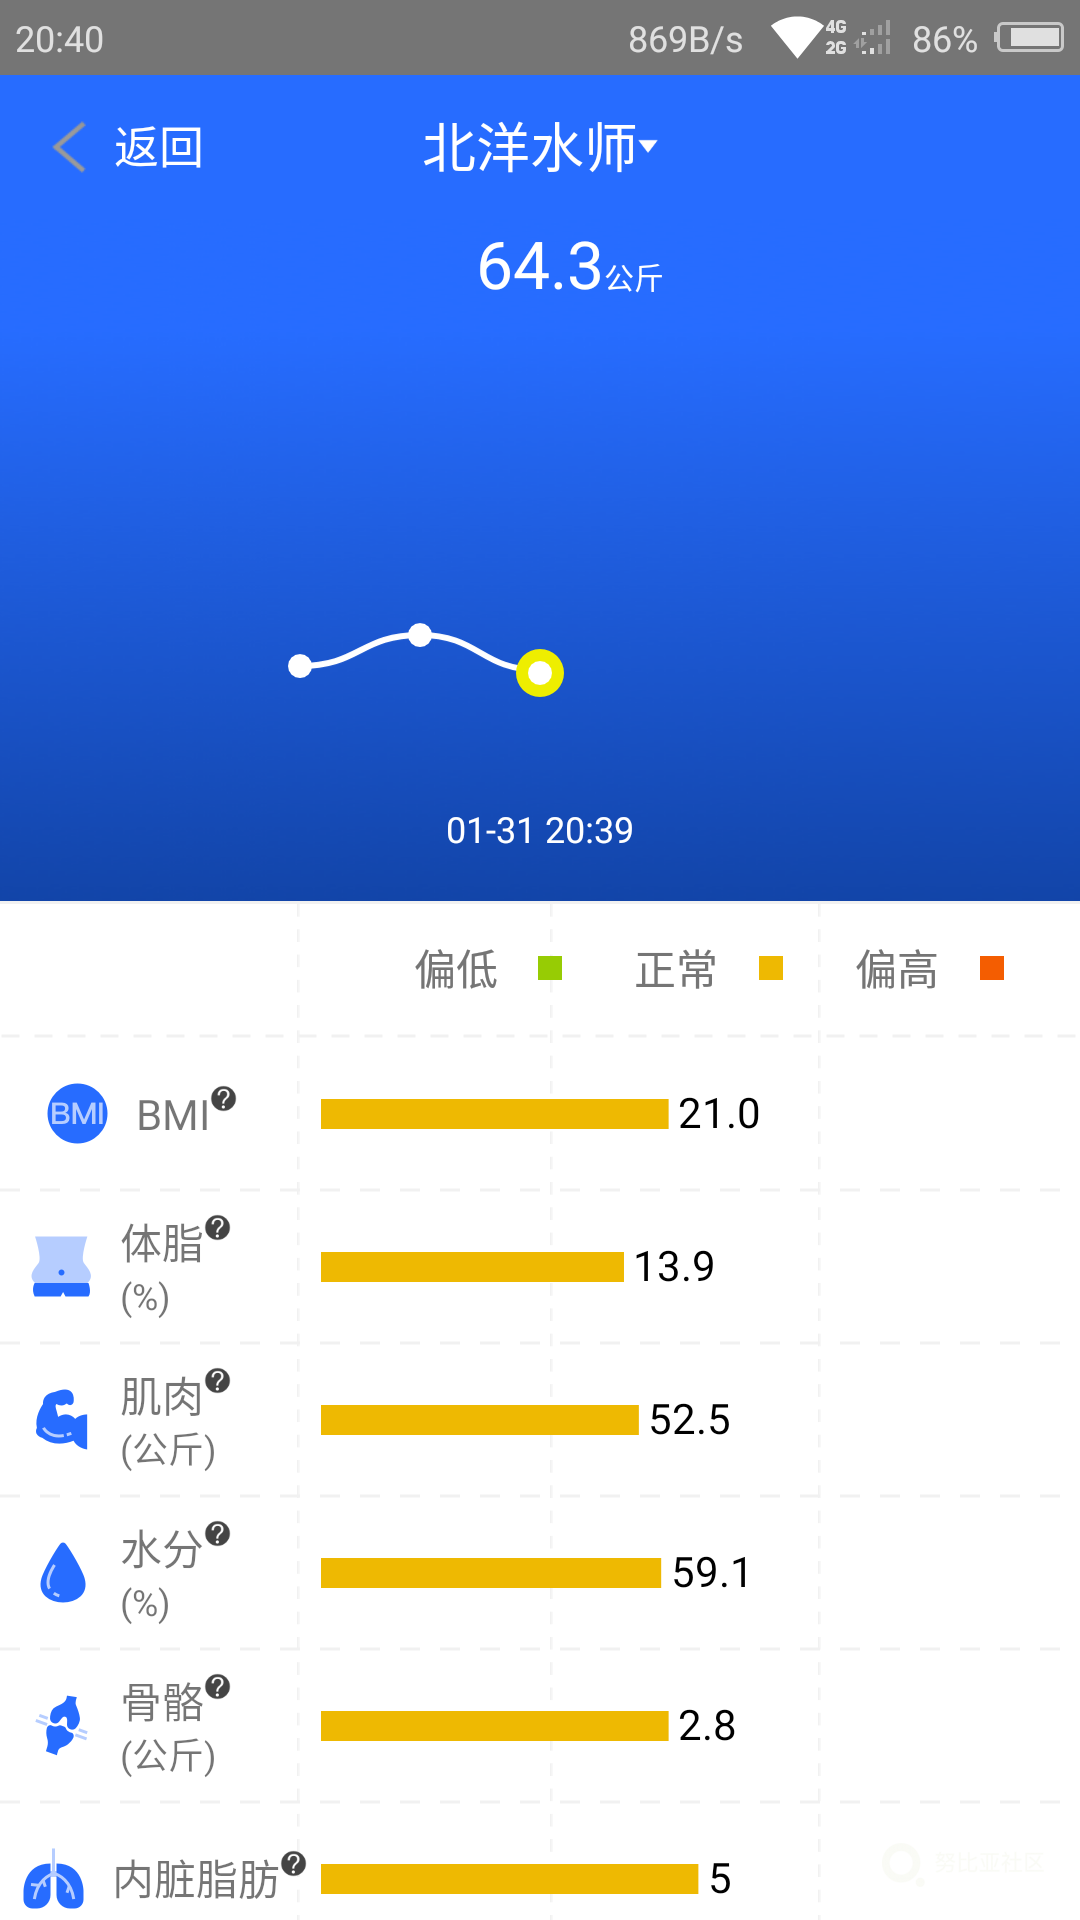 Screenshot_2018-01-31-20-40-17.png